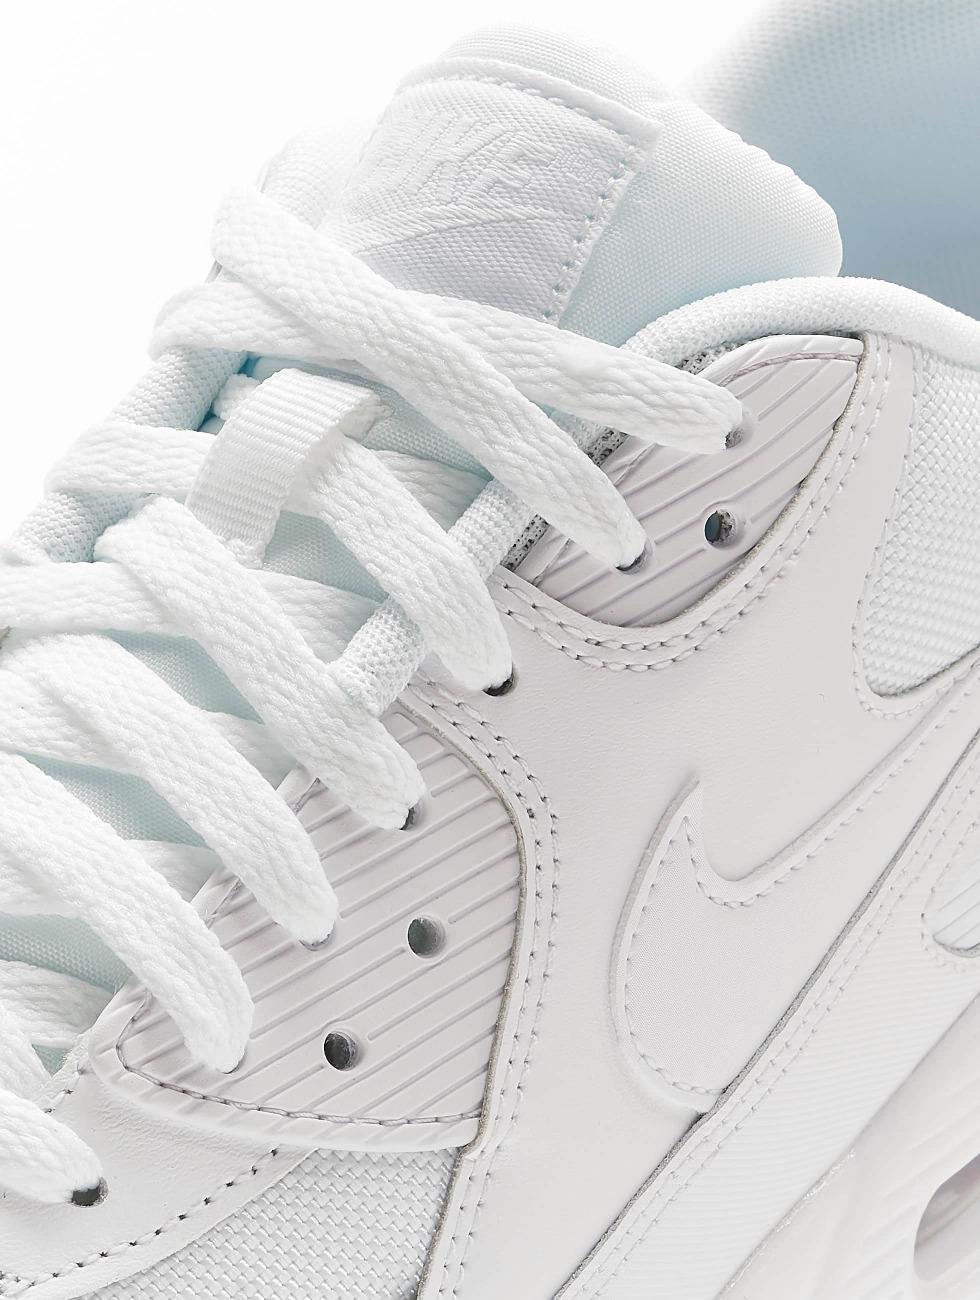 Nike Schoen / Sneaker Air Max 90 Essenziale Ingegno 118688 JKUYy